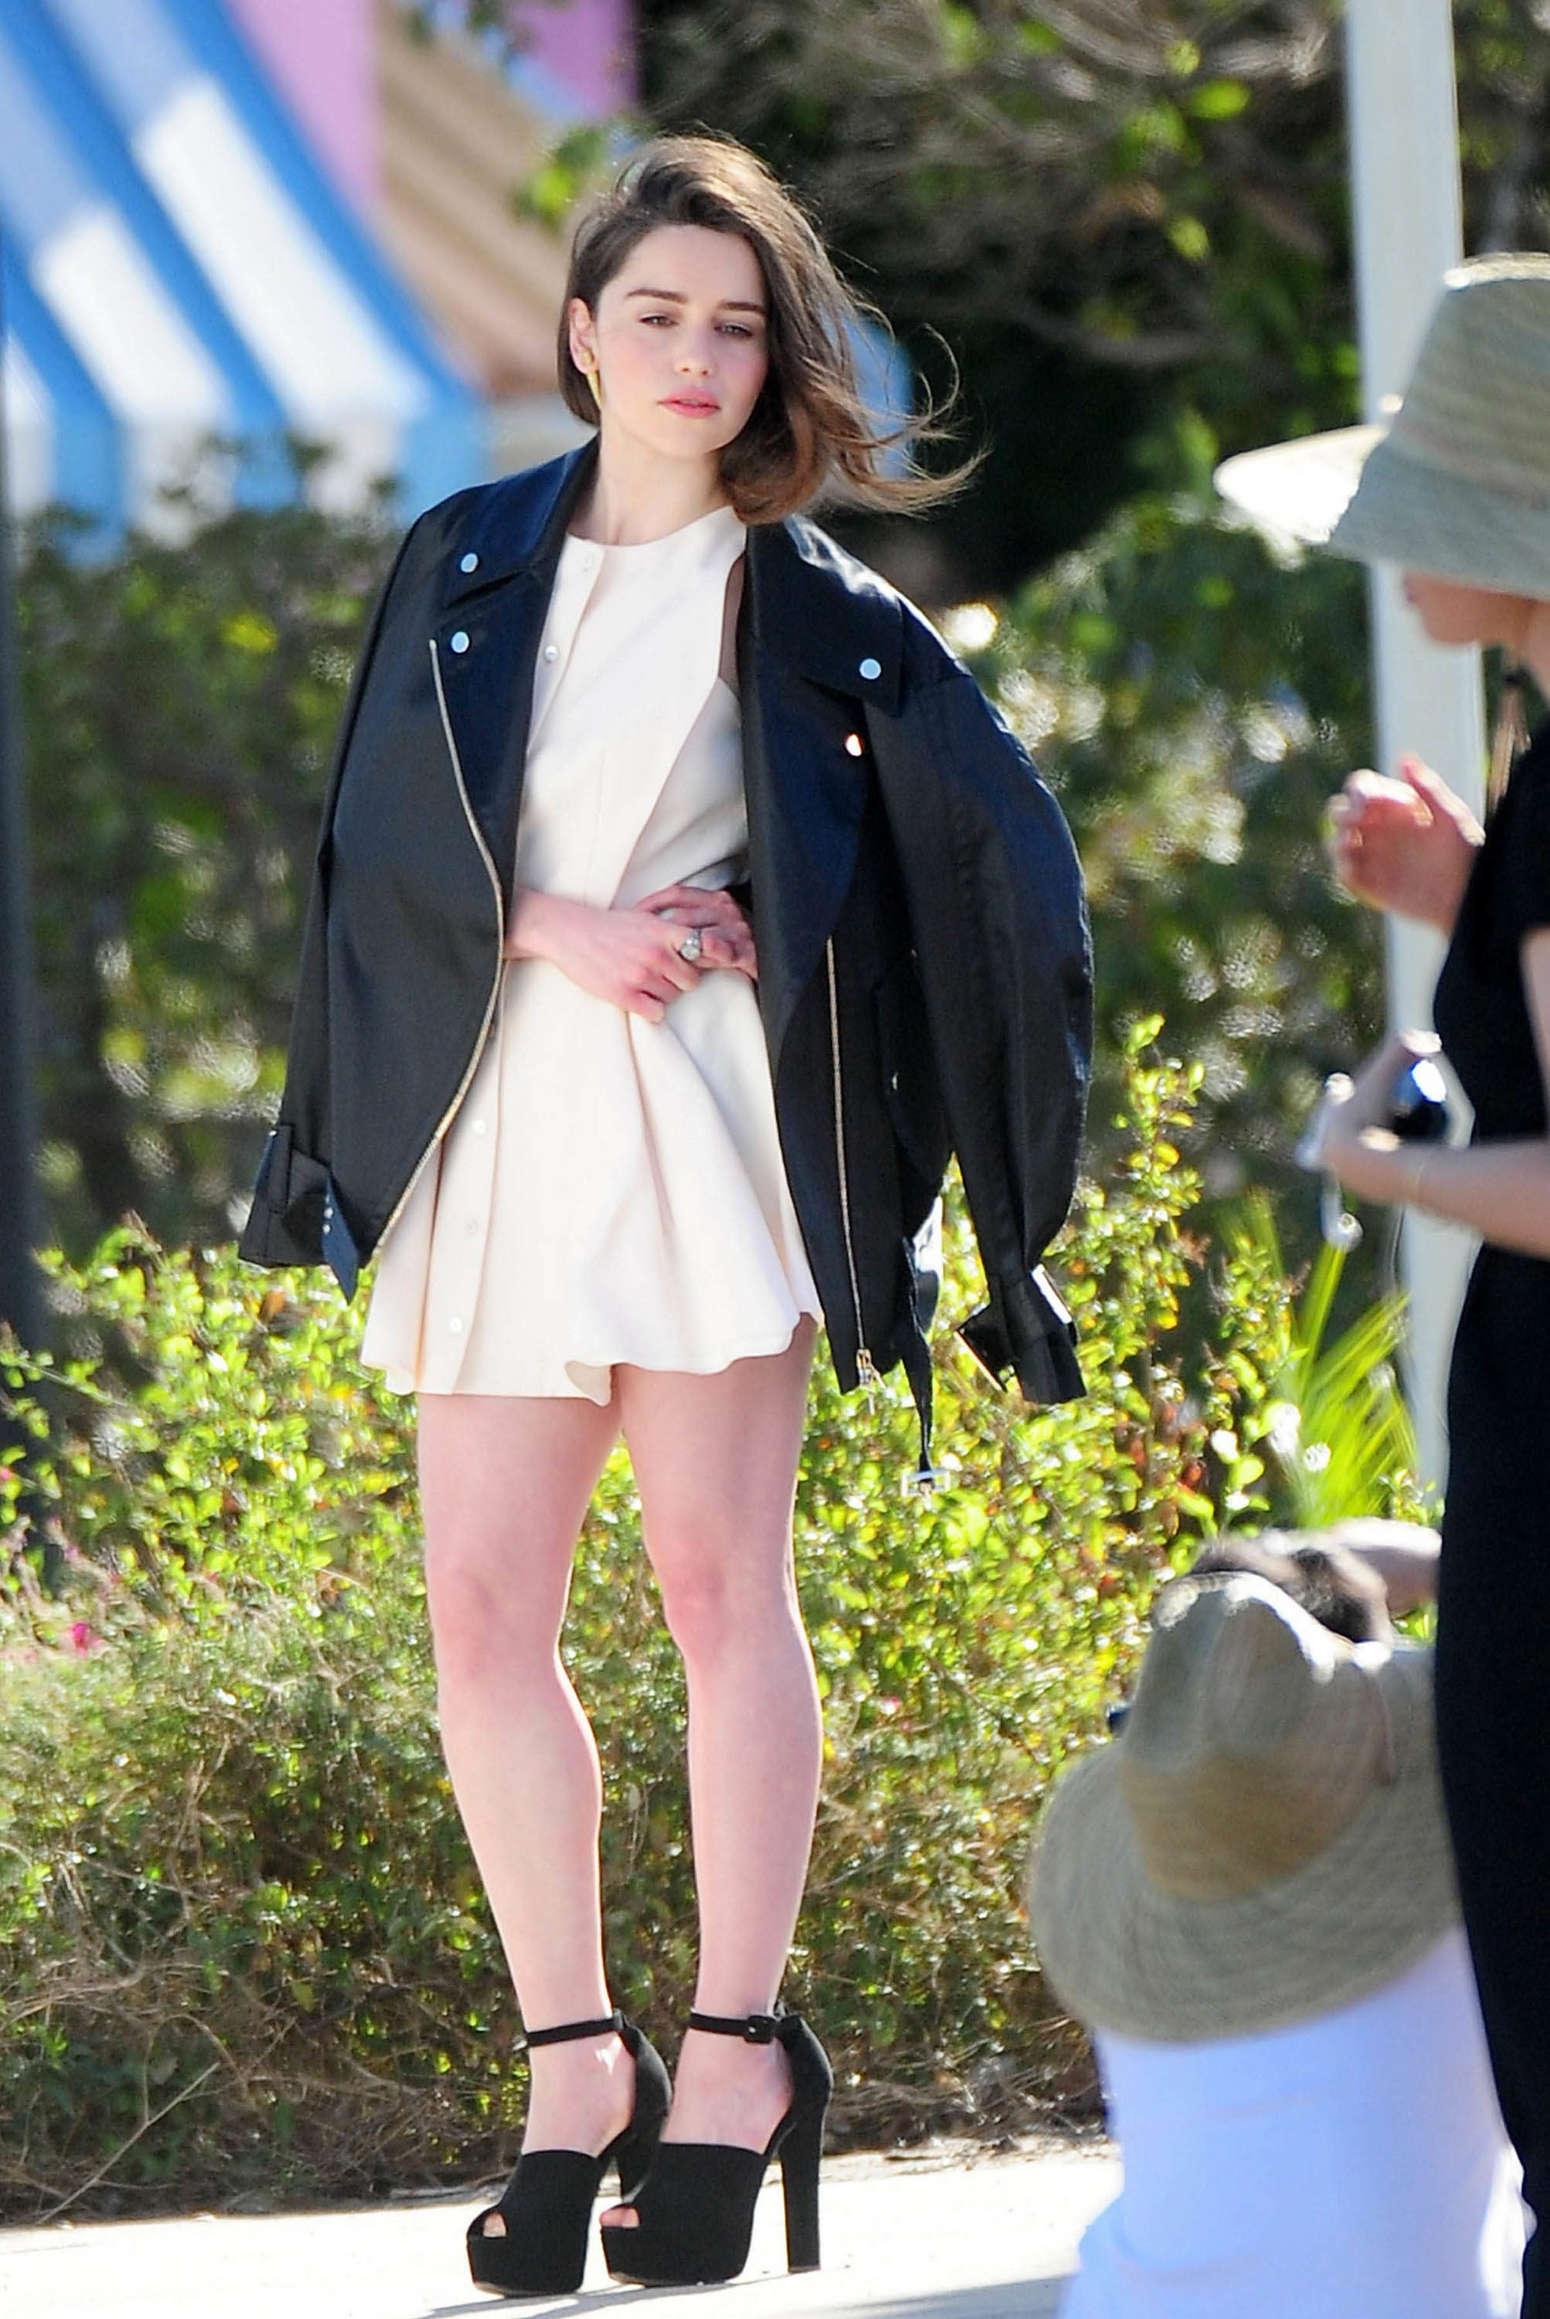 Emilia Clarke Photoshoot Candids In Los Angeles Gotceleb